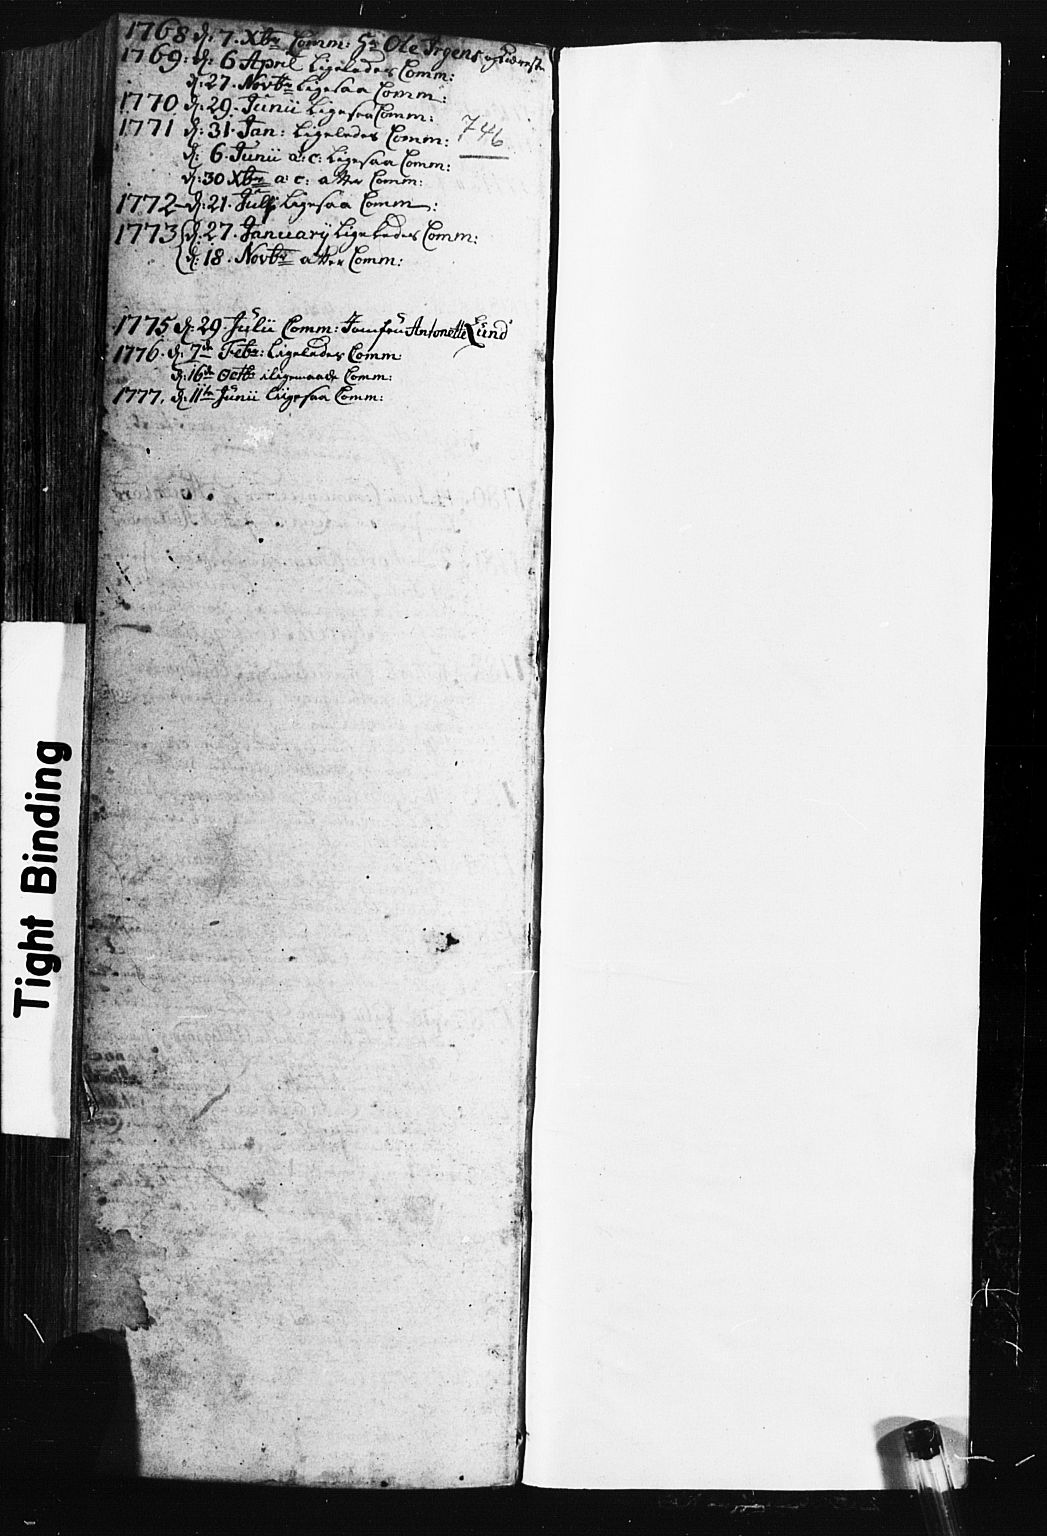 SAH, Fåberg prestekontor, Klokkerbok nr. 3, 1768-1796, s. 746-747